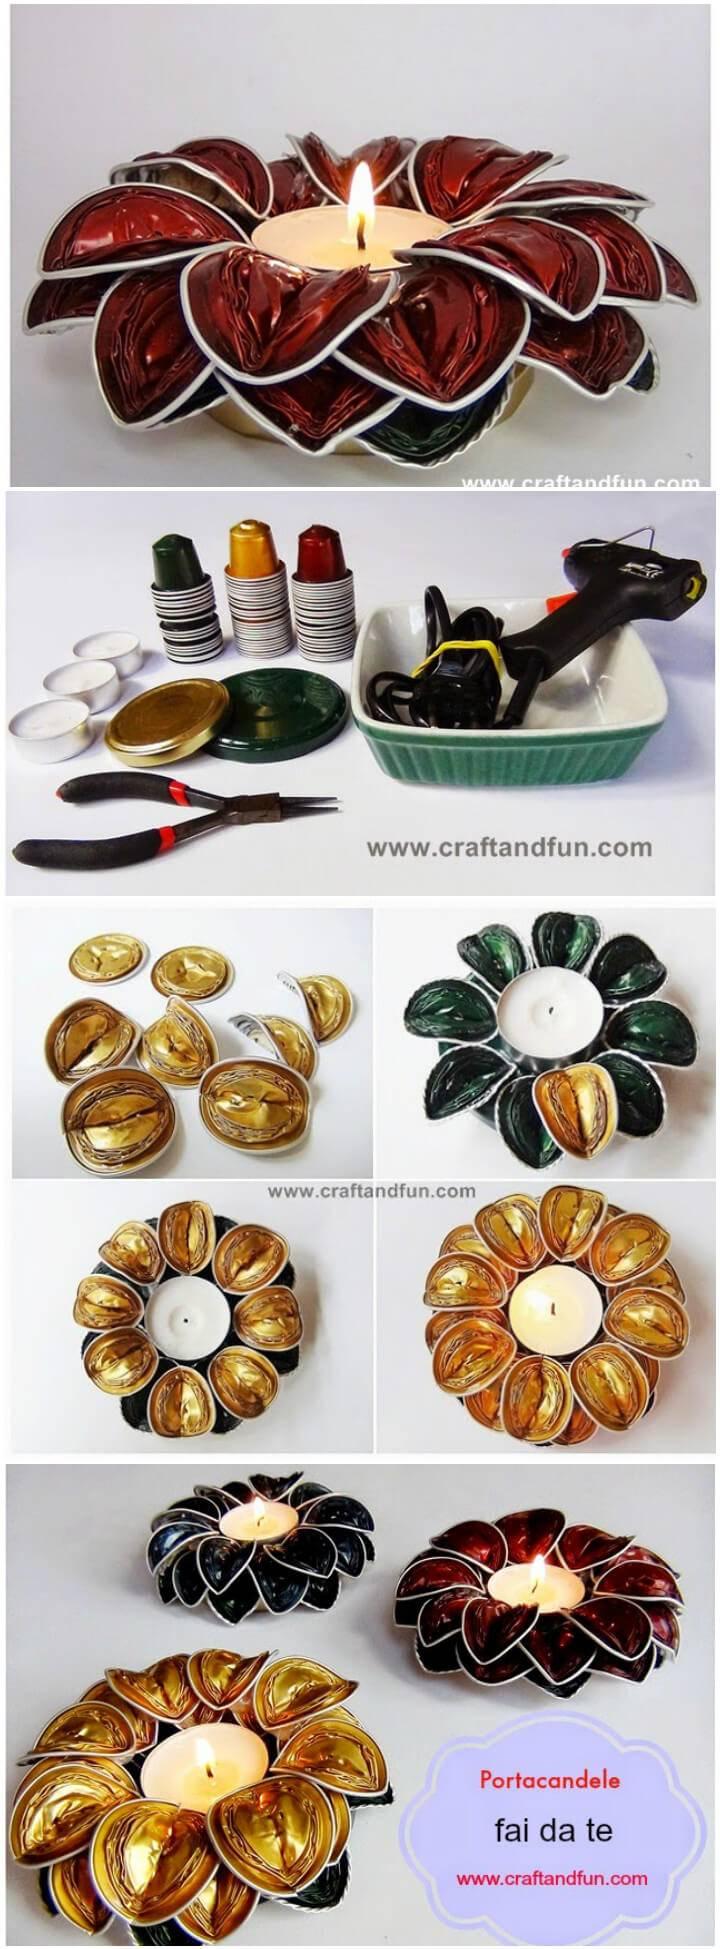 beautiful nespresso capsules votives